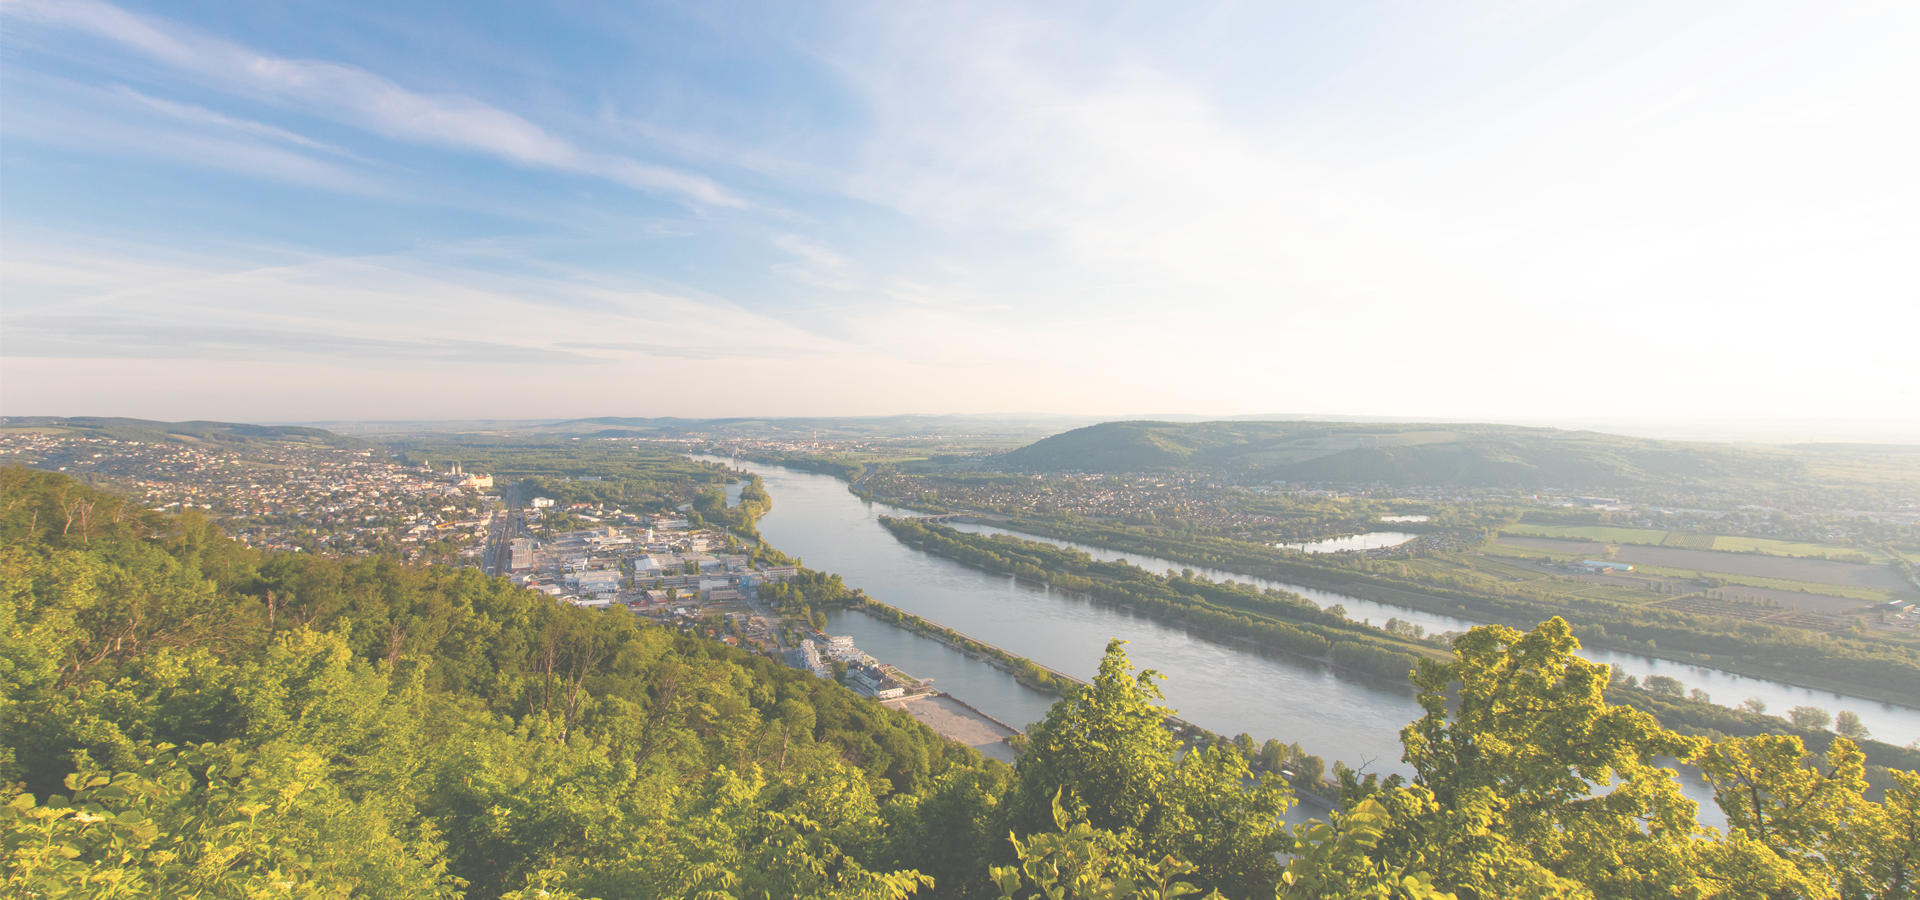 <b>Klosterneuburg, Lower Austria, Austria</b>